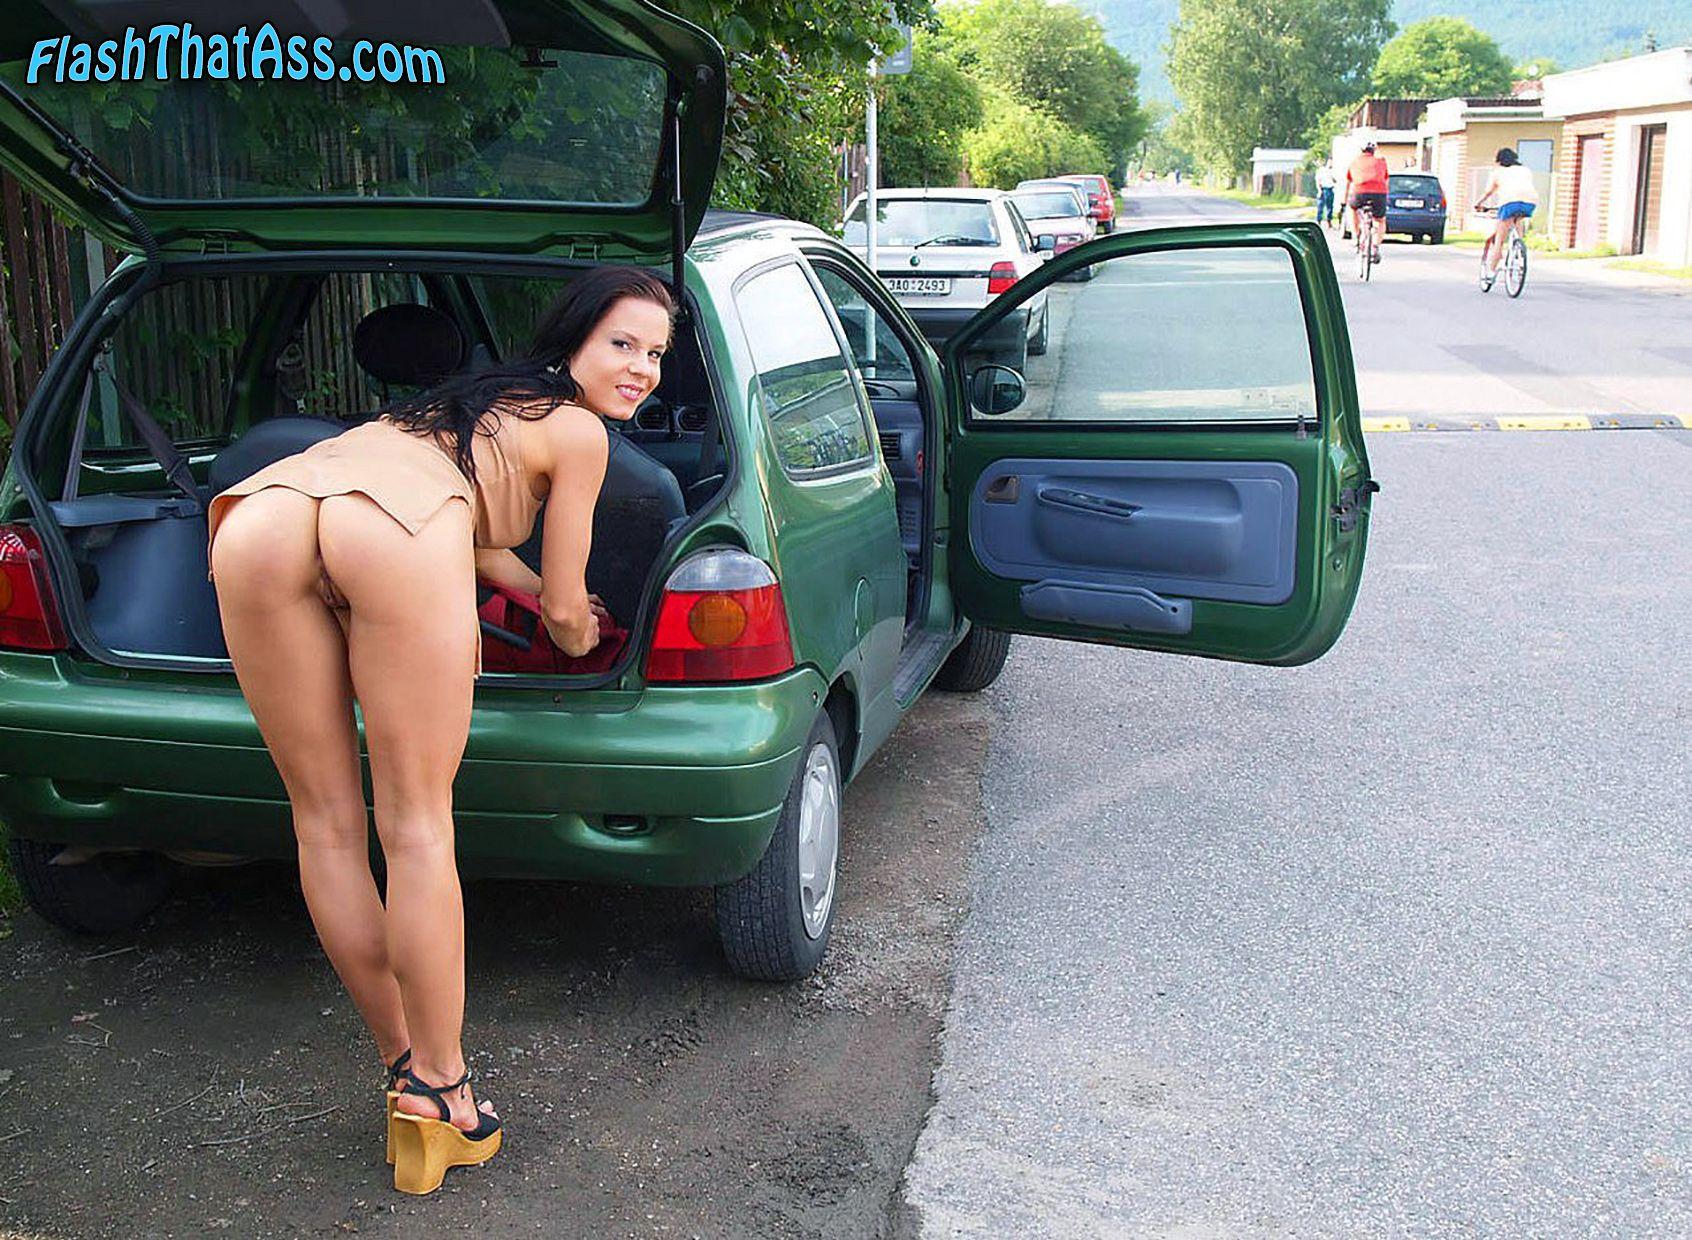 Milf naked girls in public